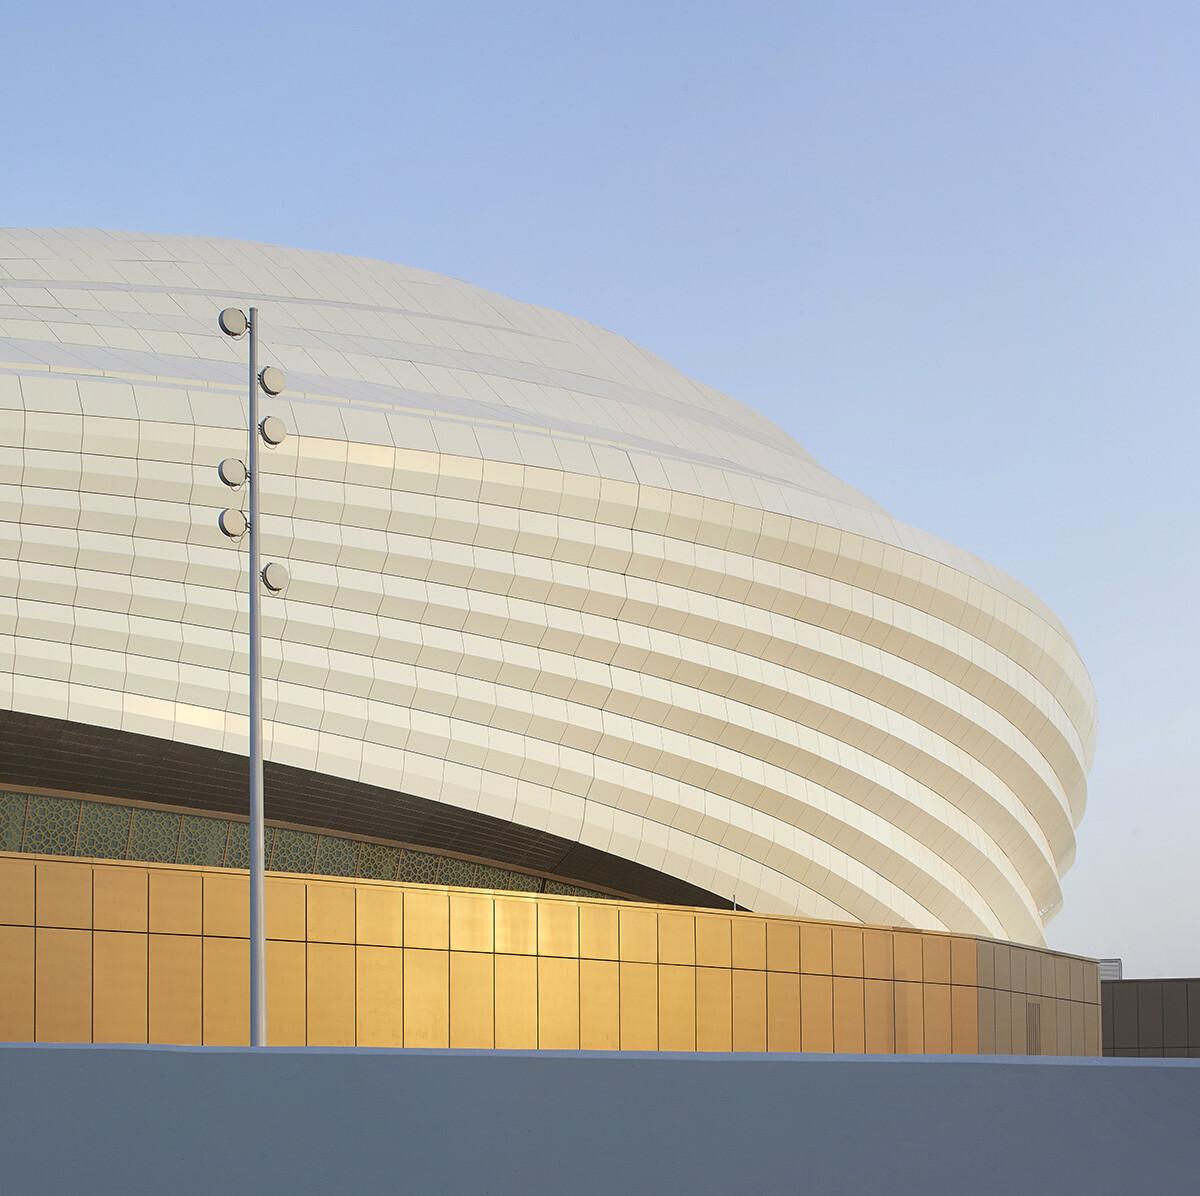 06_zha_alwakrahstadium_qatar_hufto.jpg